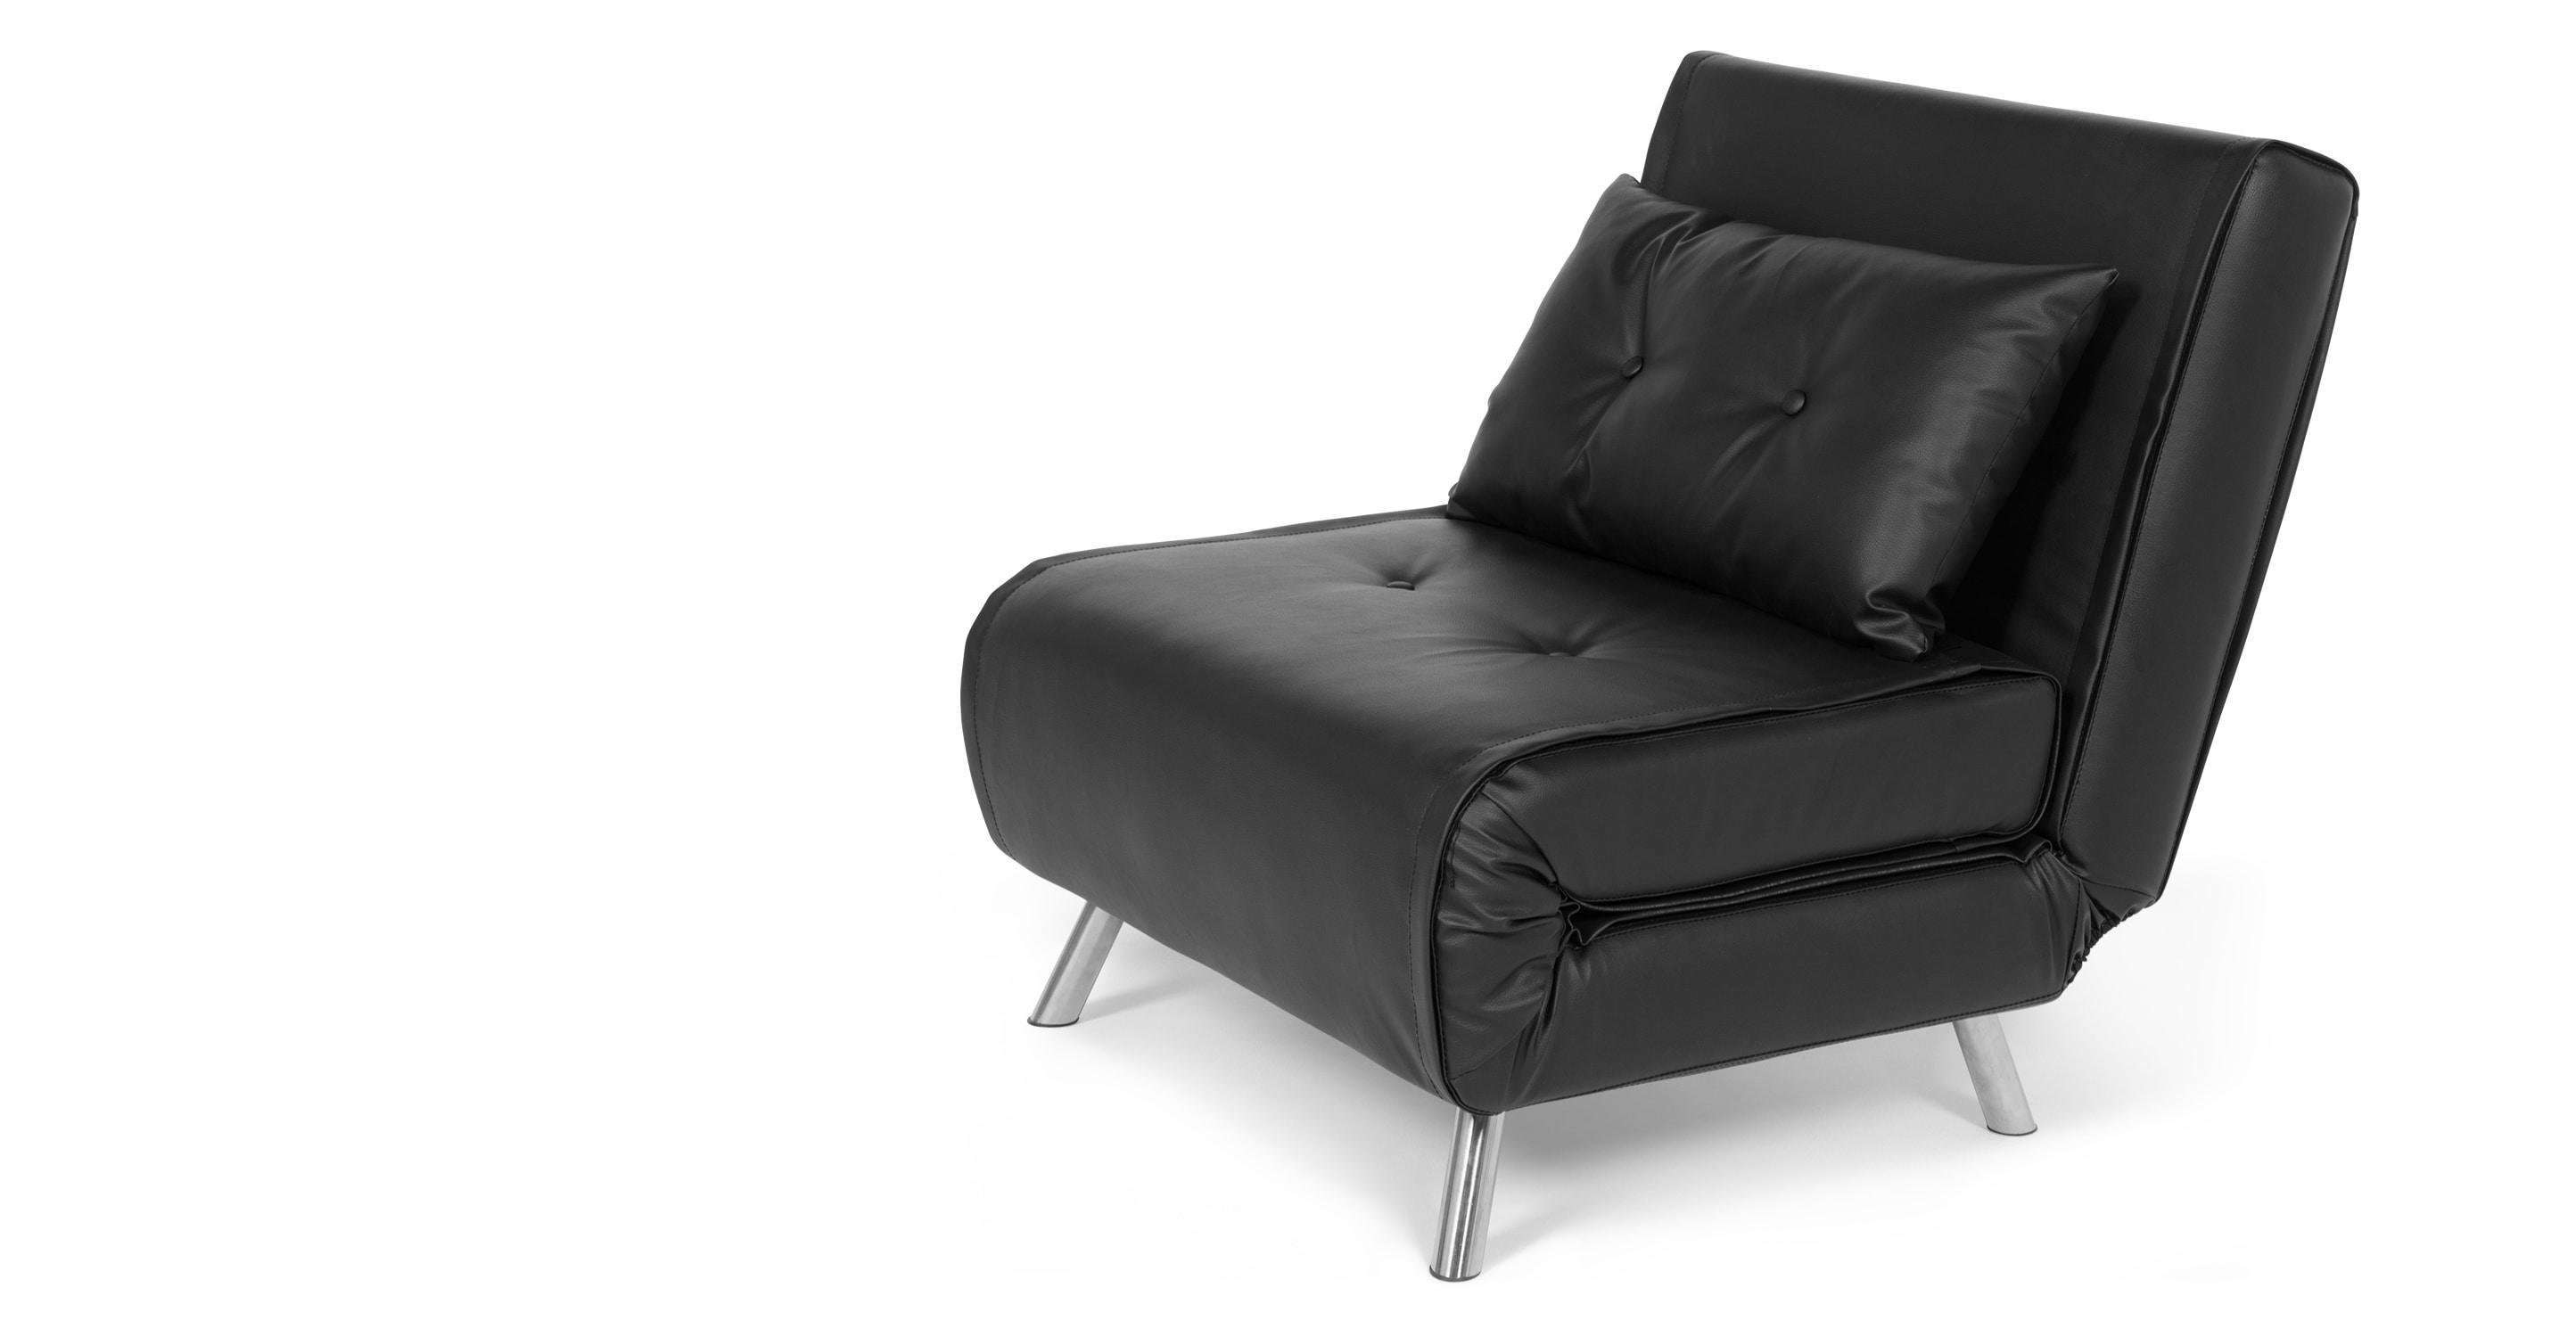 Furniture Home : Hana Armchair Single Sofa Bed Single Sofa Bed With Cheap Single Sofa Bed Chairs (Image 11 of 20)